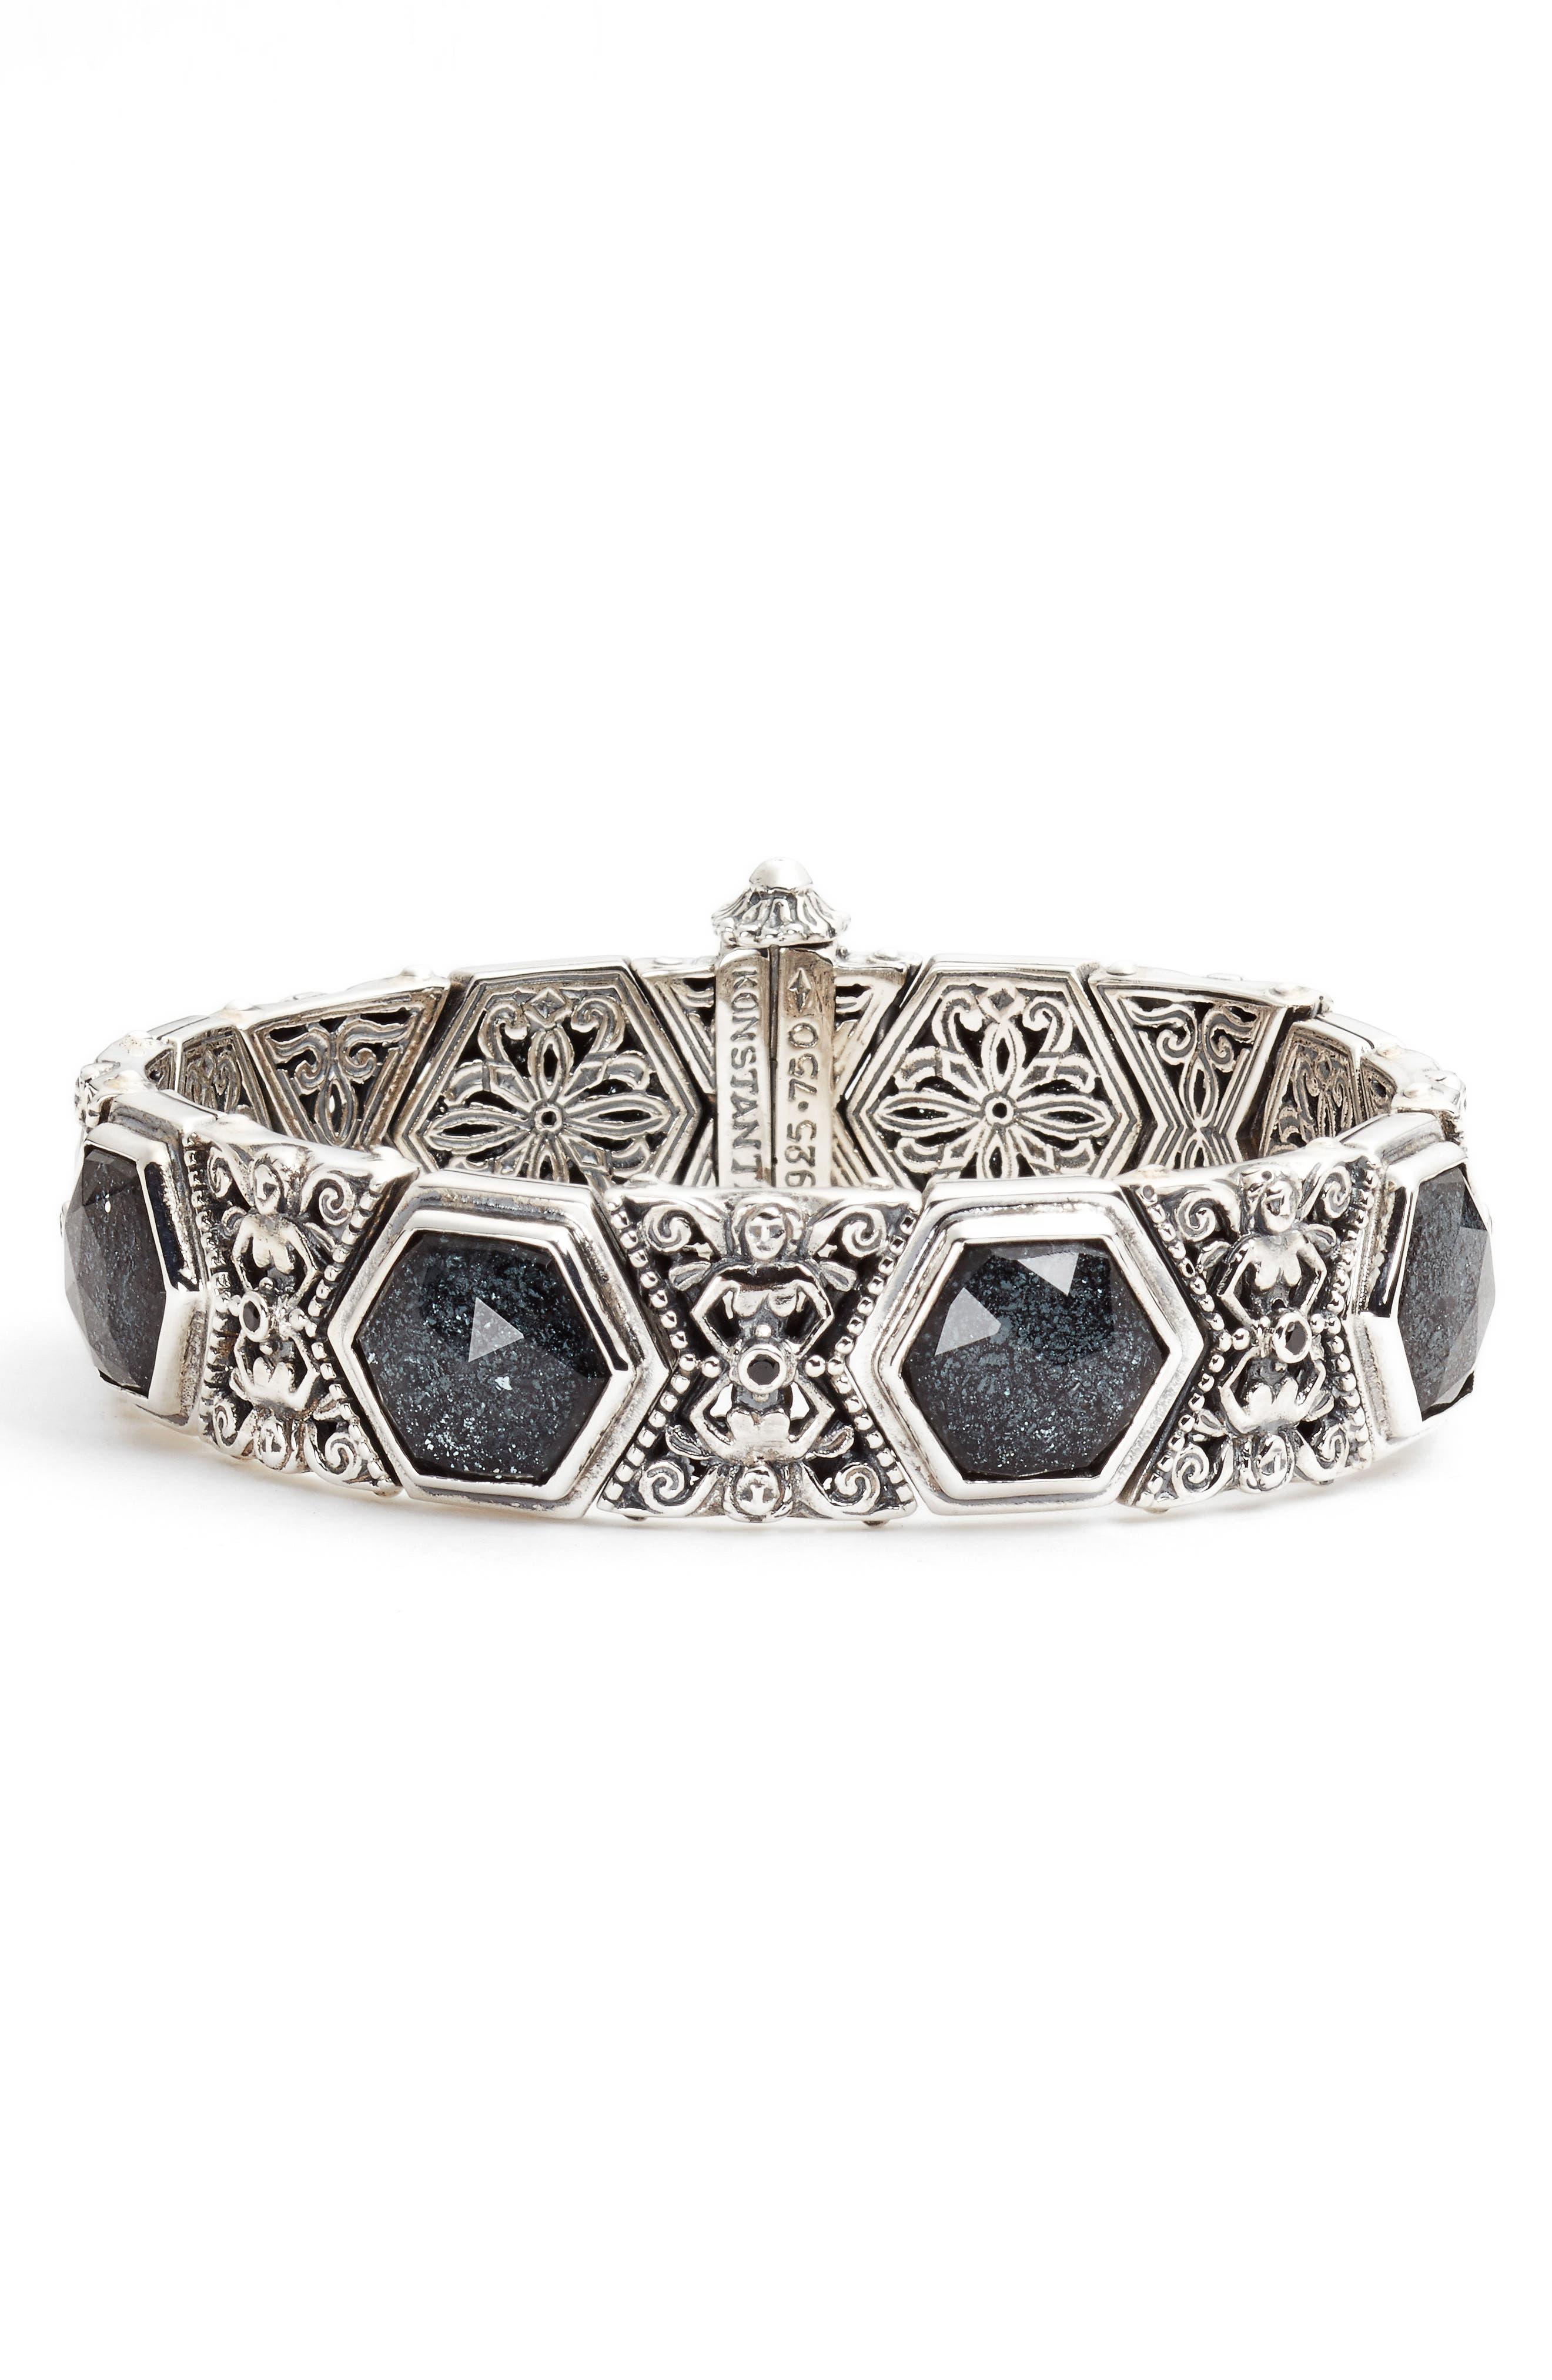 Santorini Hematite Bracelet,                             Main thumbnail 1, color,                             Silver/ Hematite